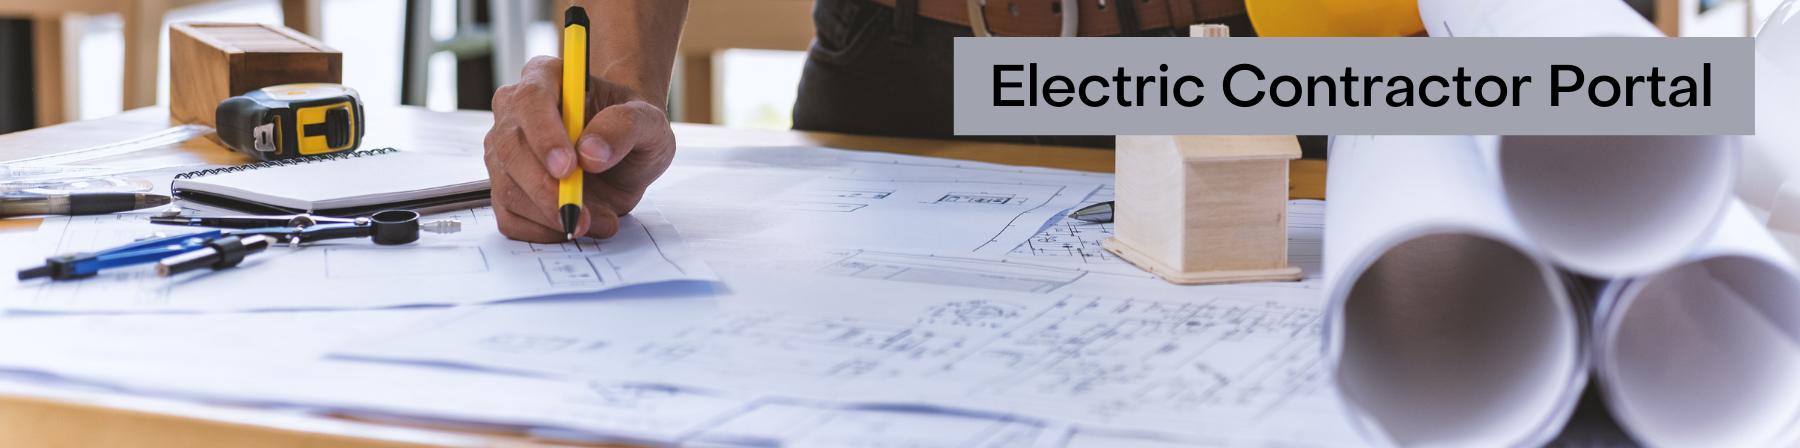 Electric Contractor Portal